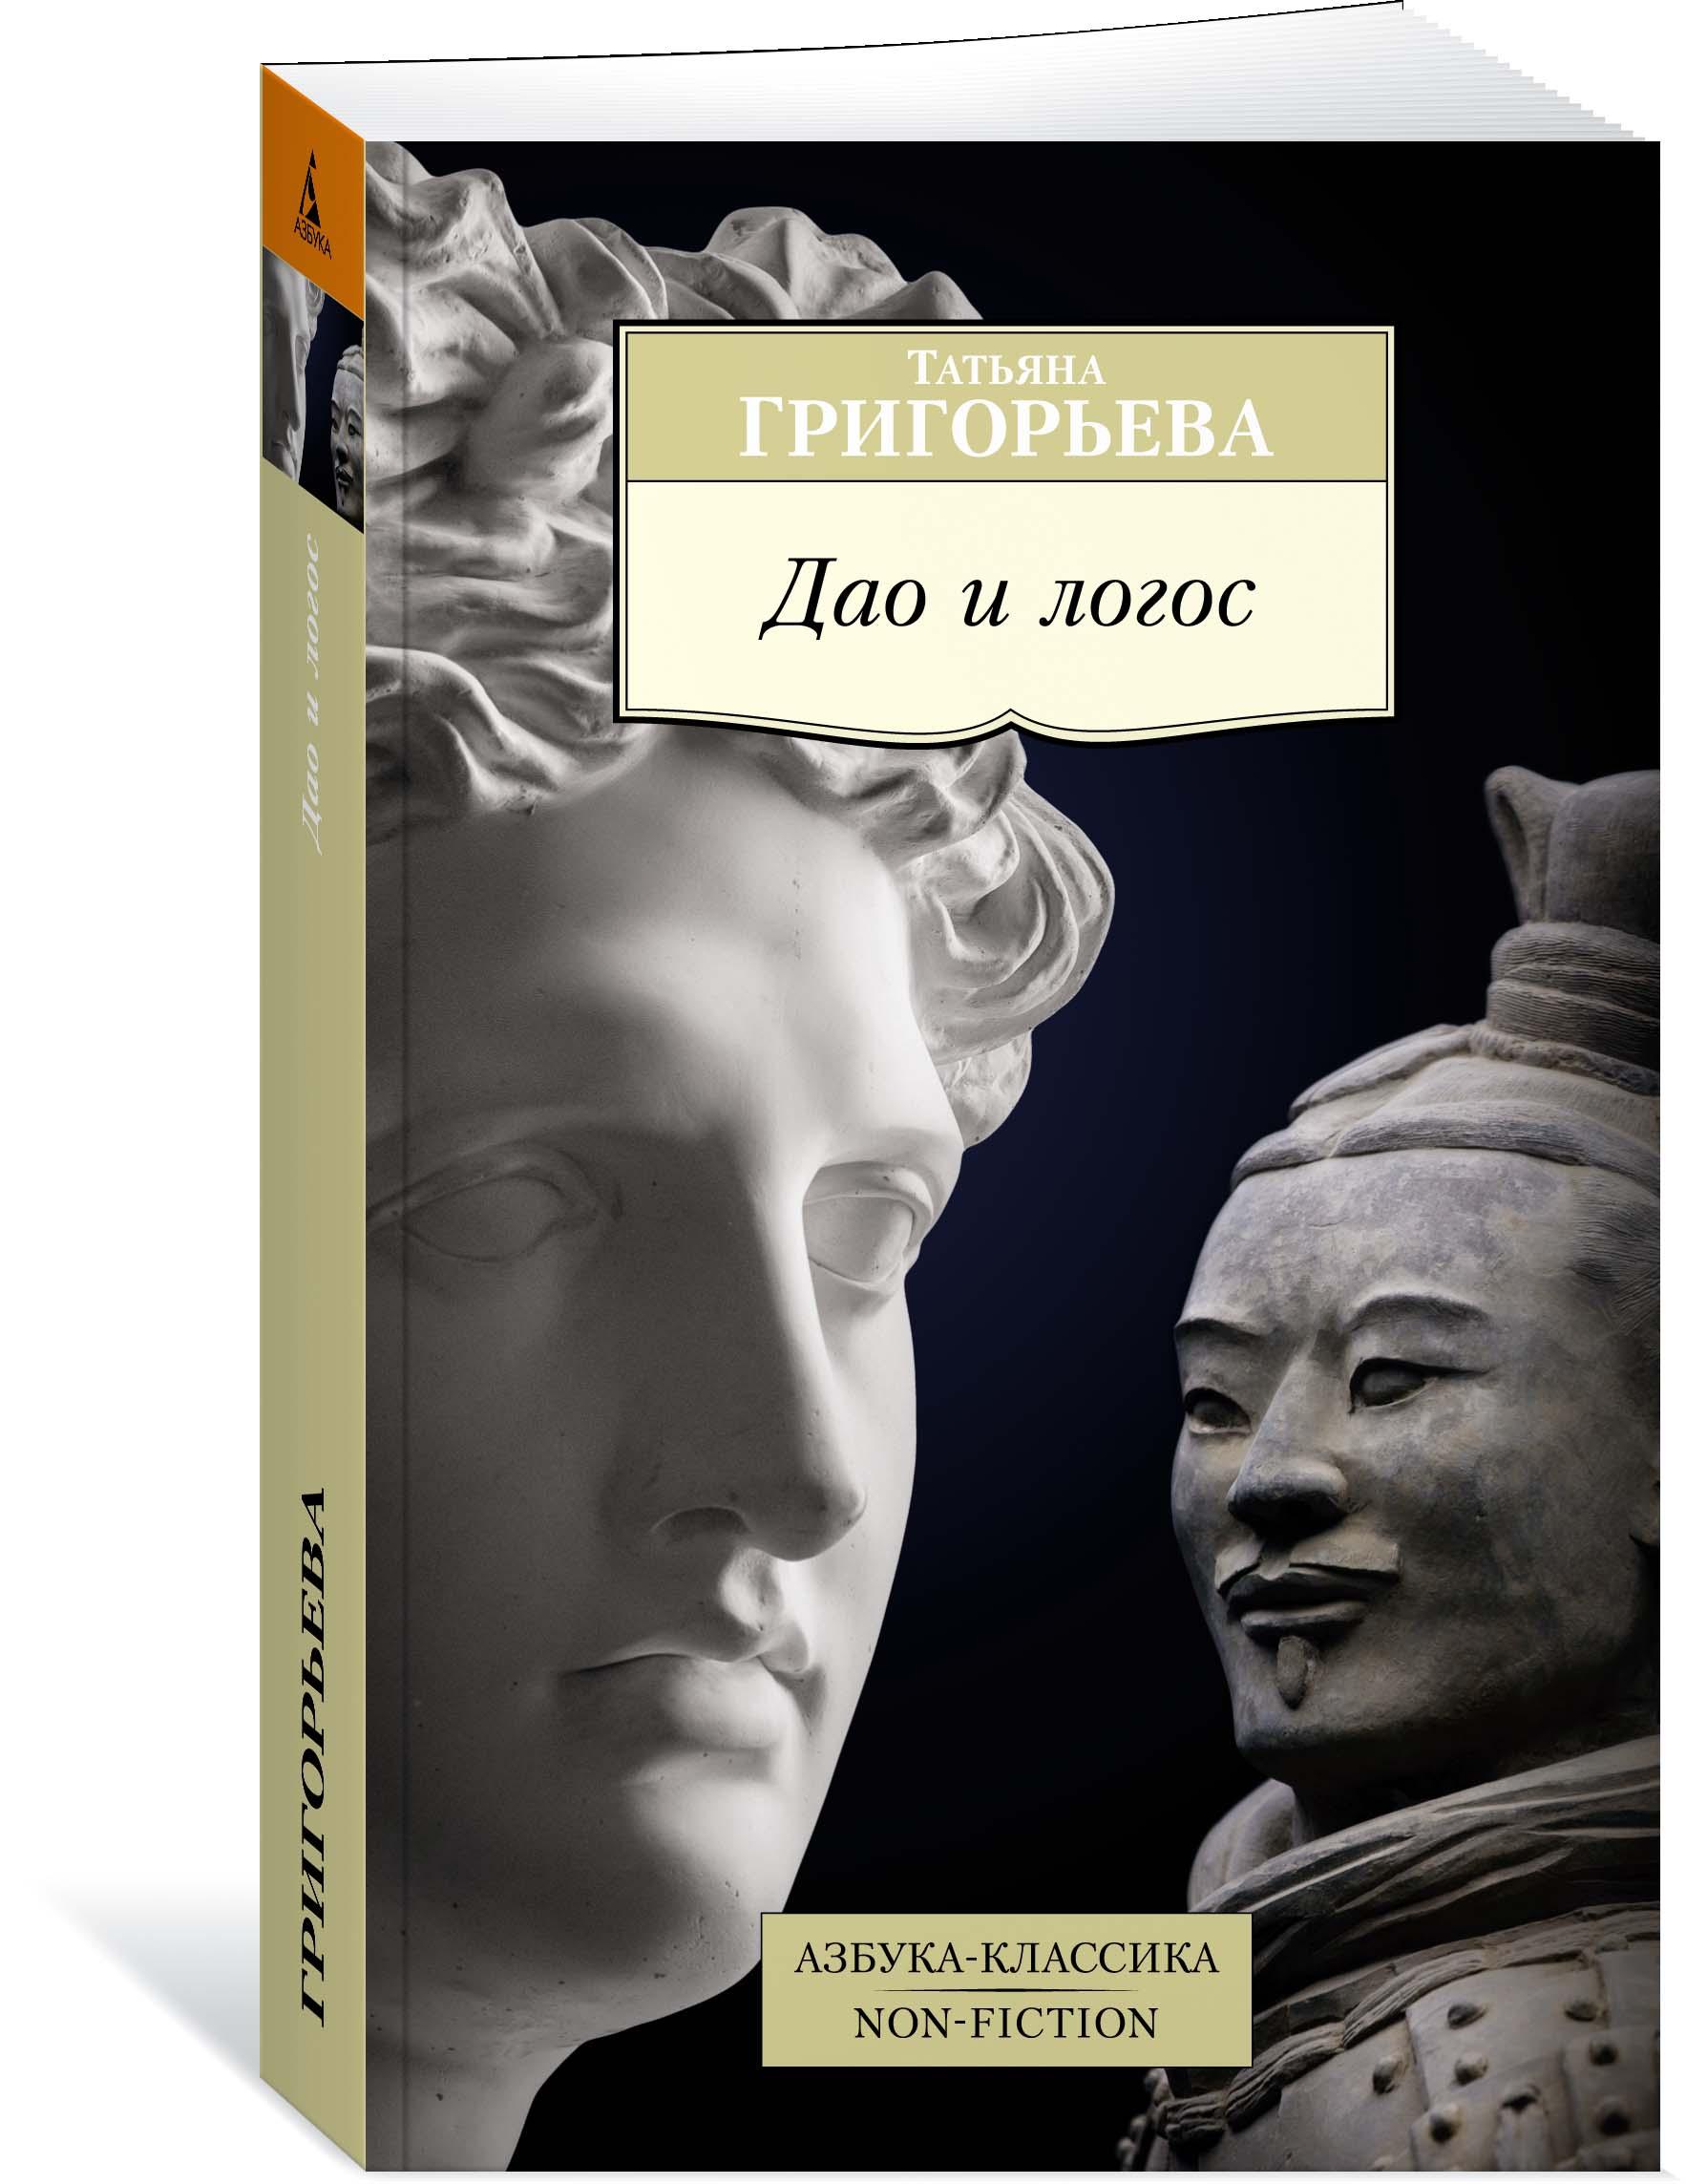 Дао и логос   Григорьева Татьяна Петровна